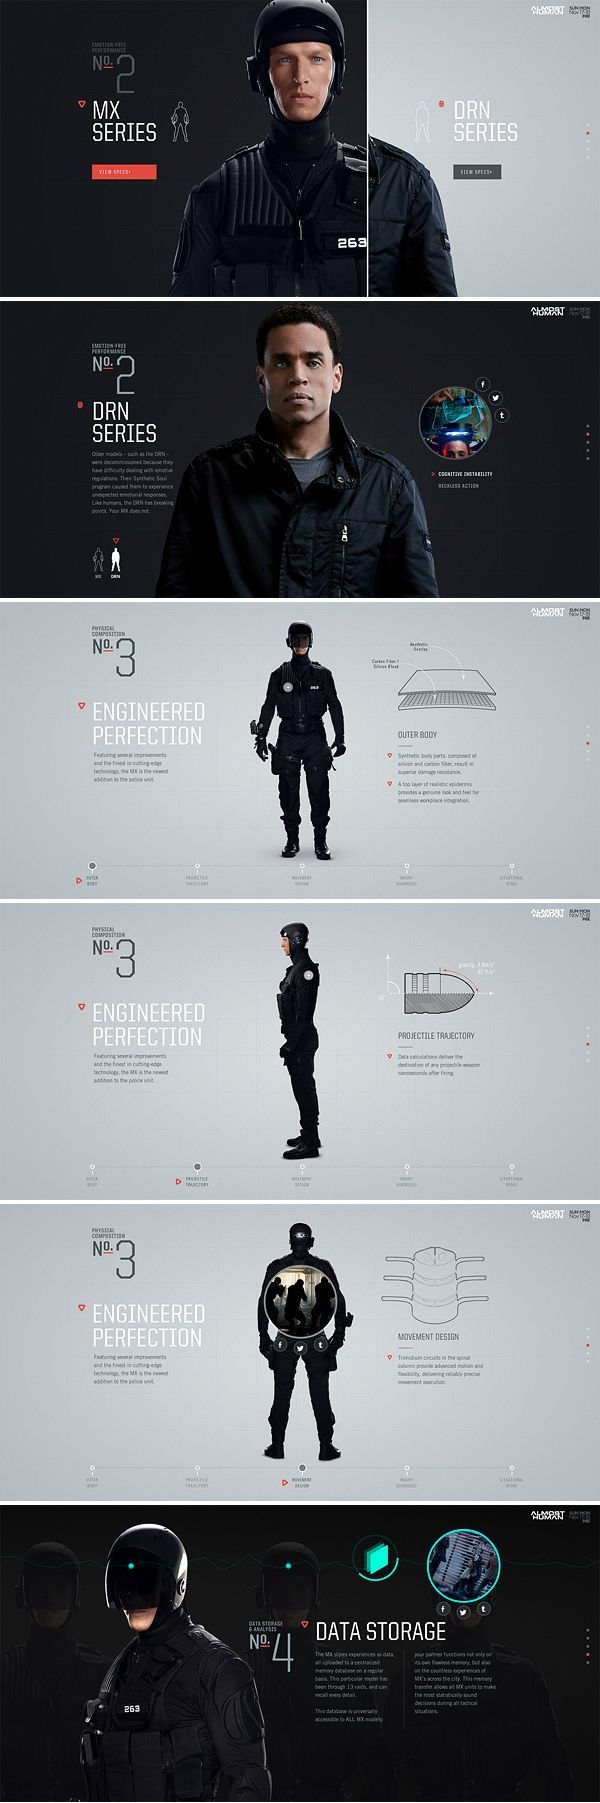 Almost Human by Brijan #ui #mobile #design #ResponsiveDesign #Web #UI #UX #WordPress #Resposive Design #Website #Graphics